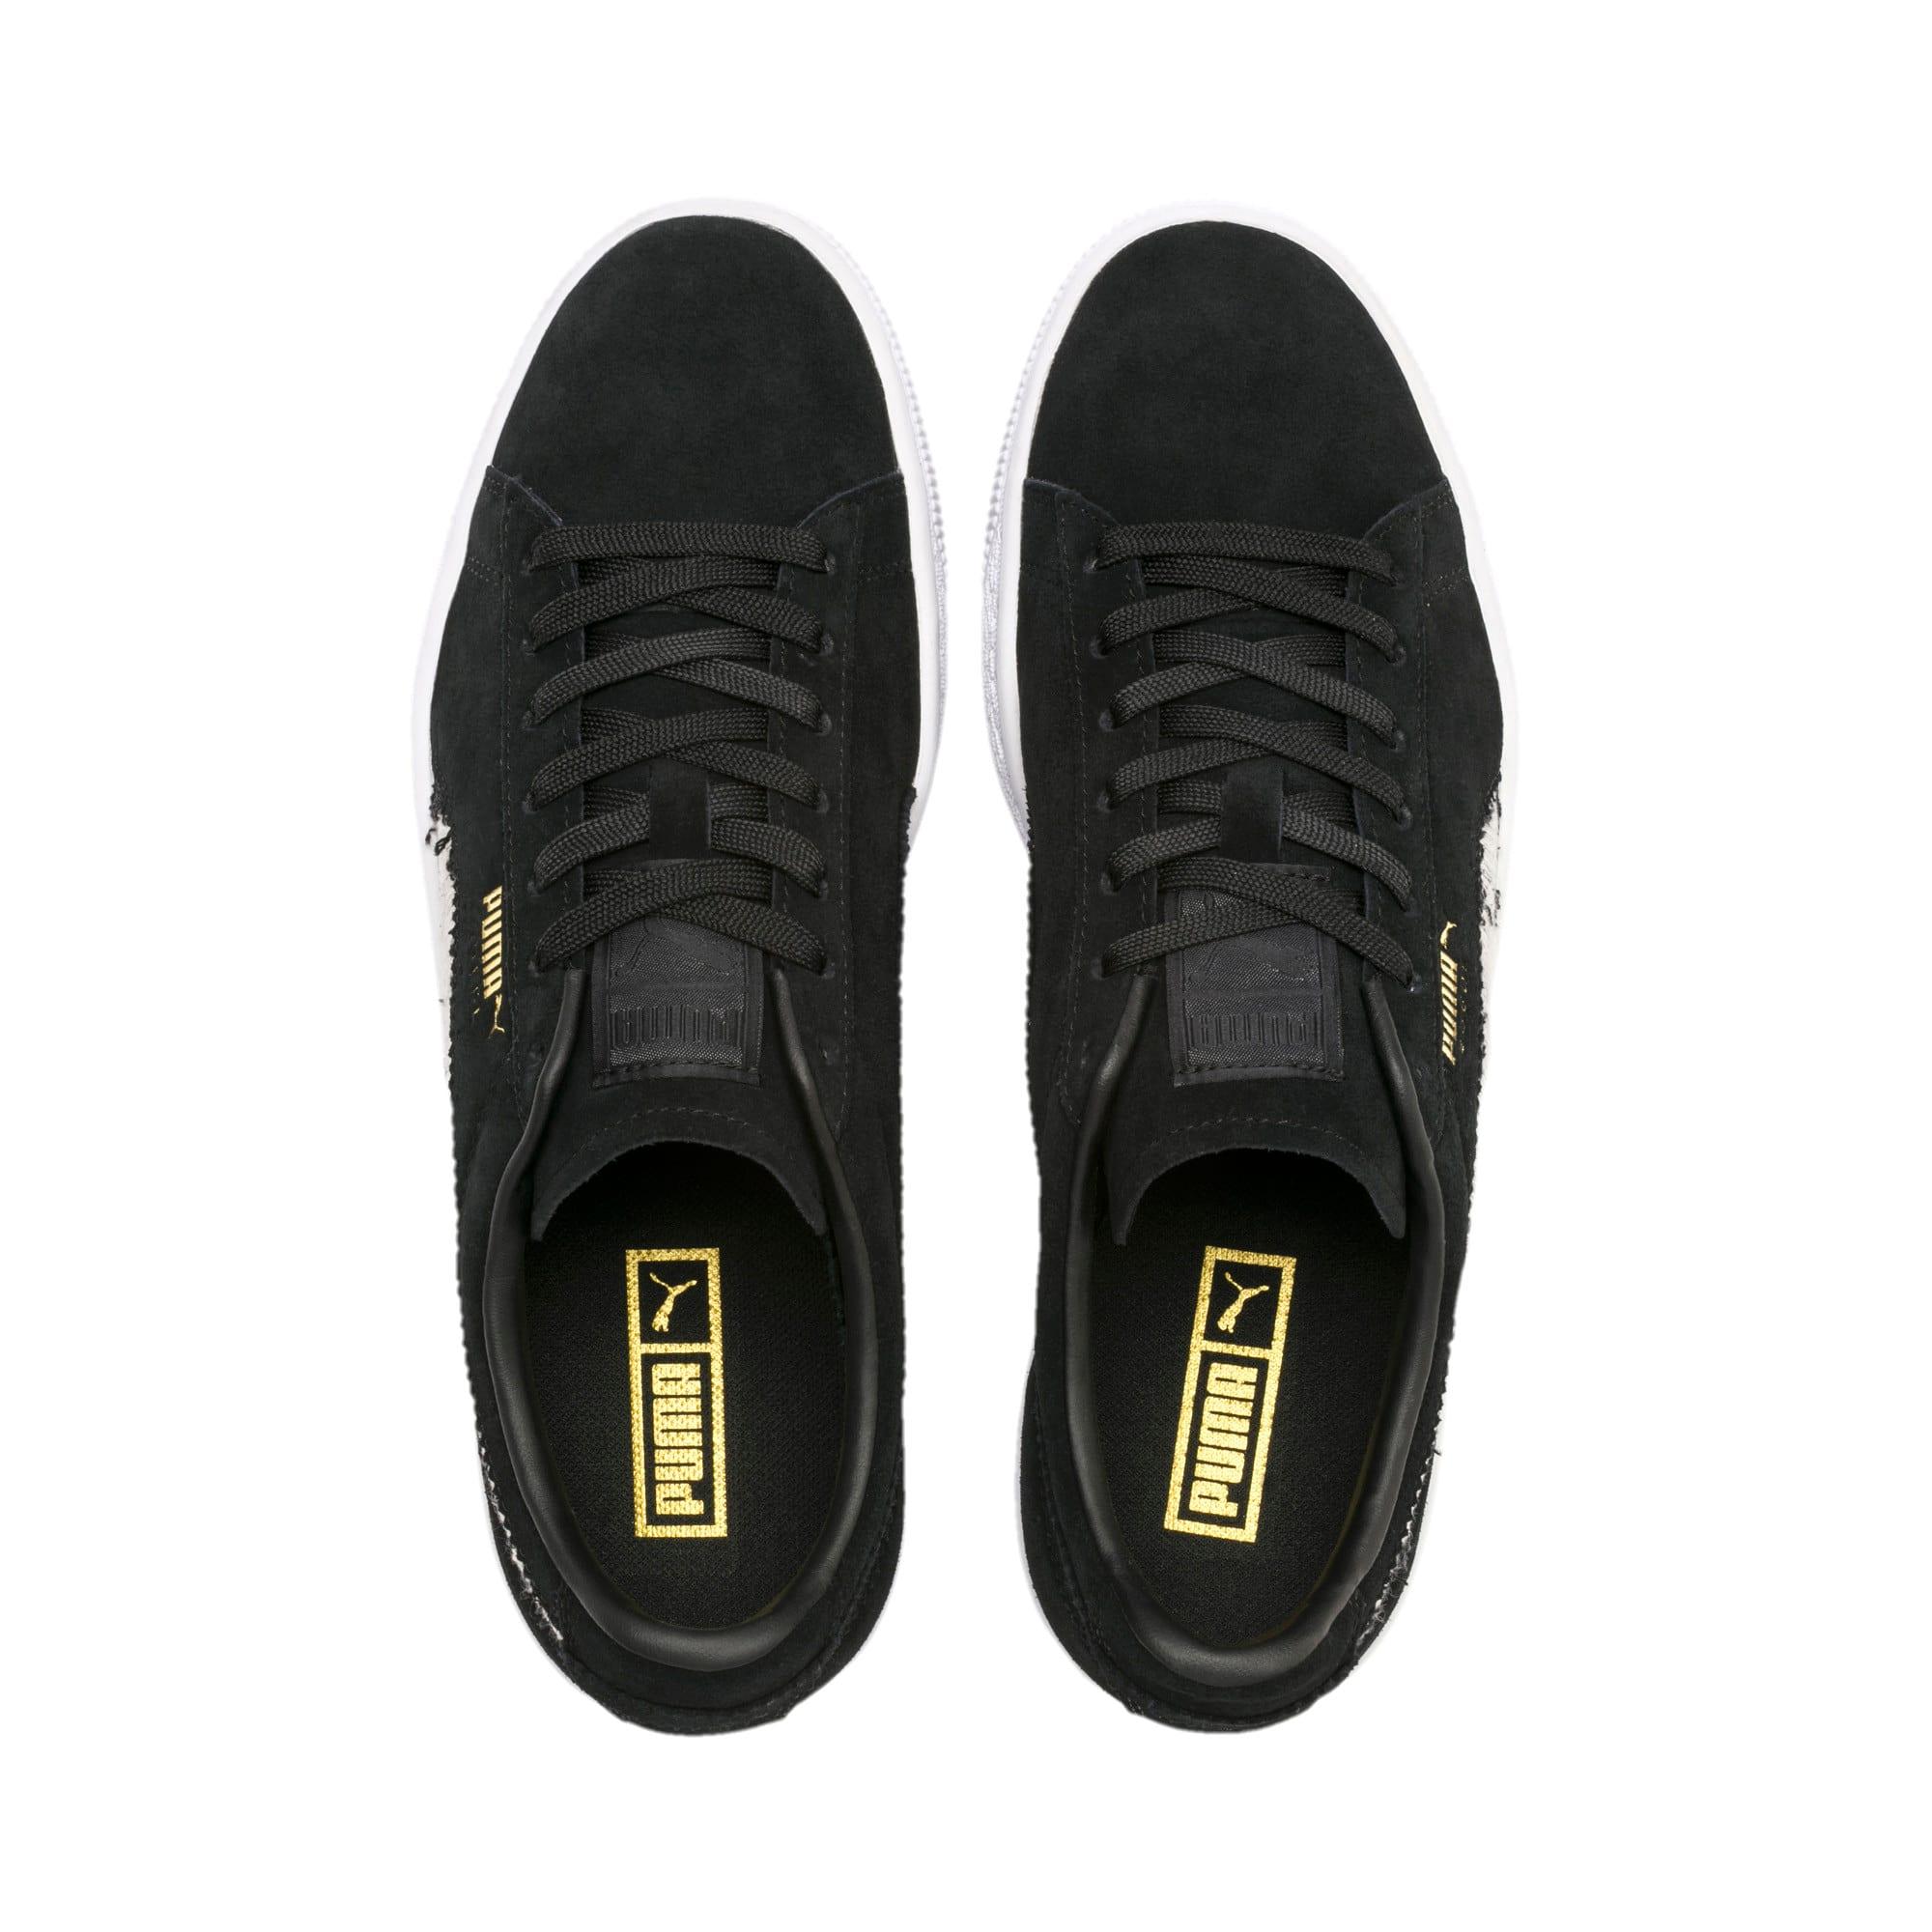 Thumbnail 7 of Suede Ripped Denim Sneakers, Puma Black-P Black-P White, medium